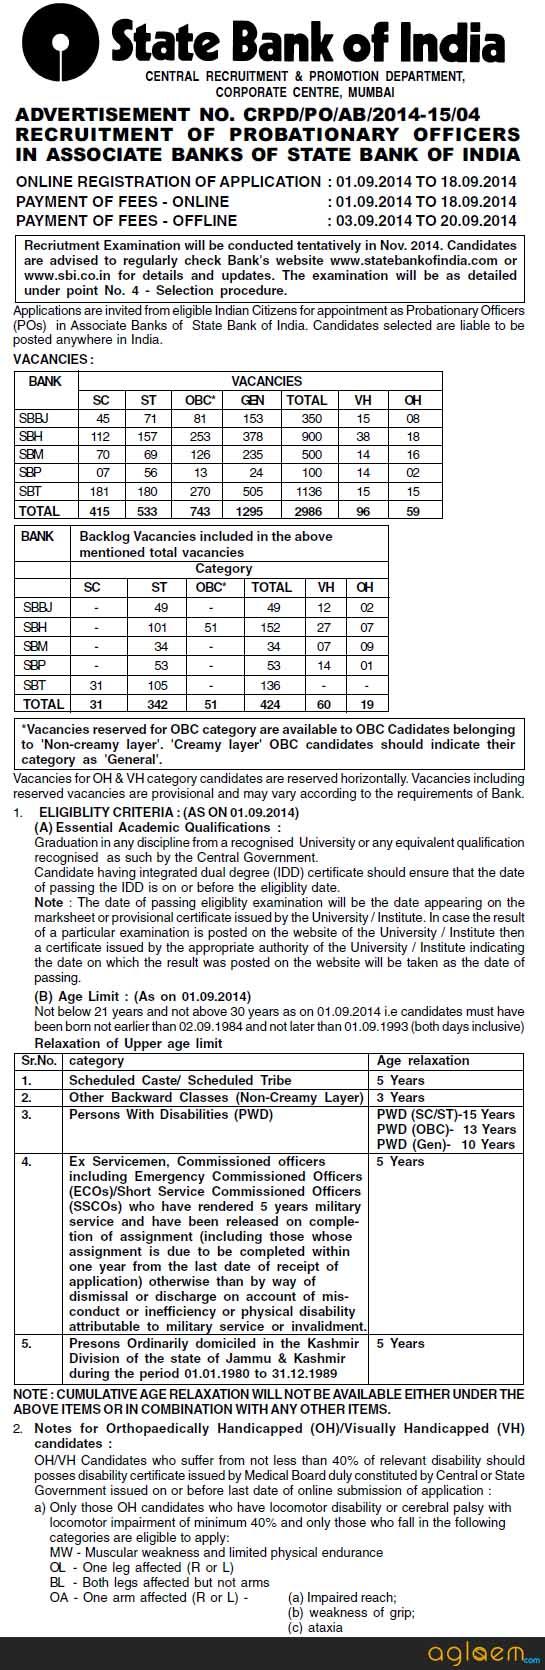 SBI Associate Bank PO Recruitment 2014 Notification